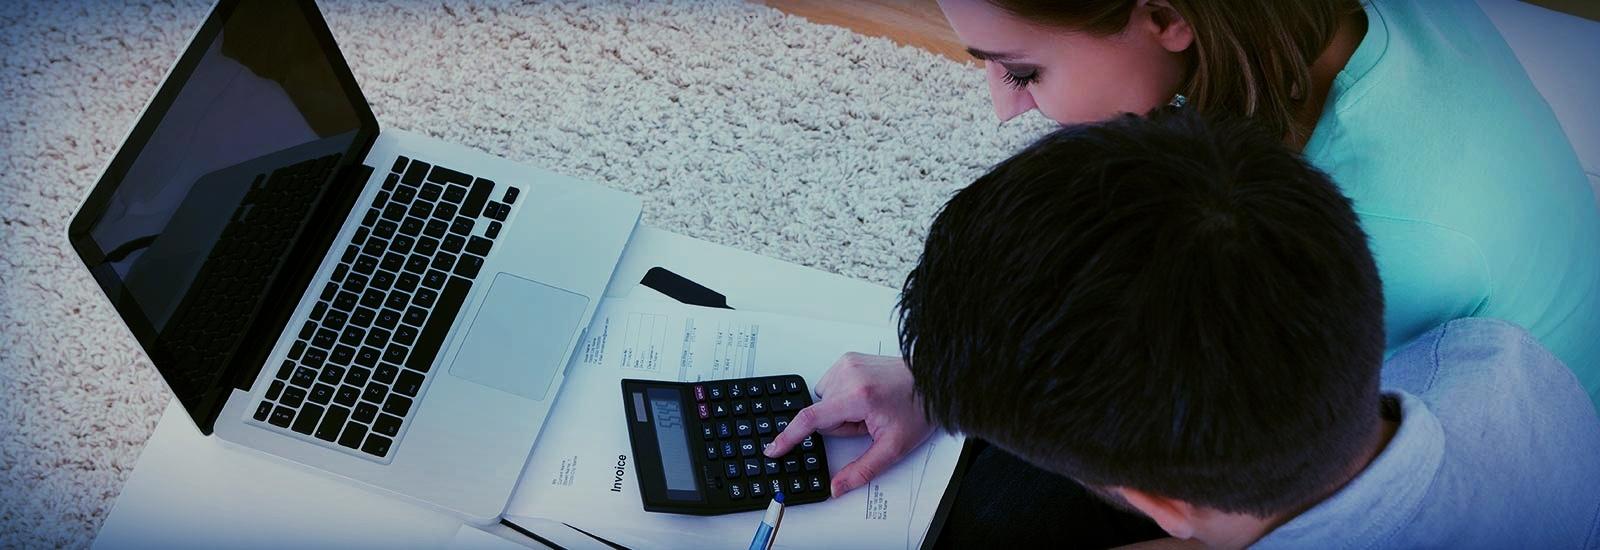 NSLU-article-title-bg-proven-strategy-reduce-debt-557897-edited